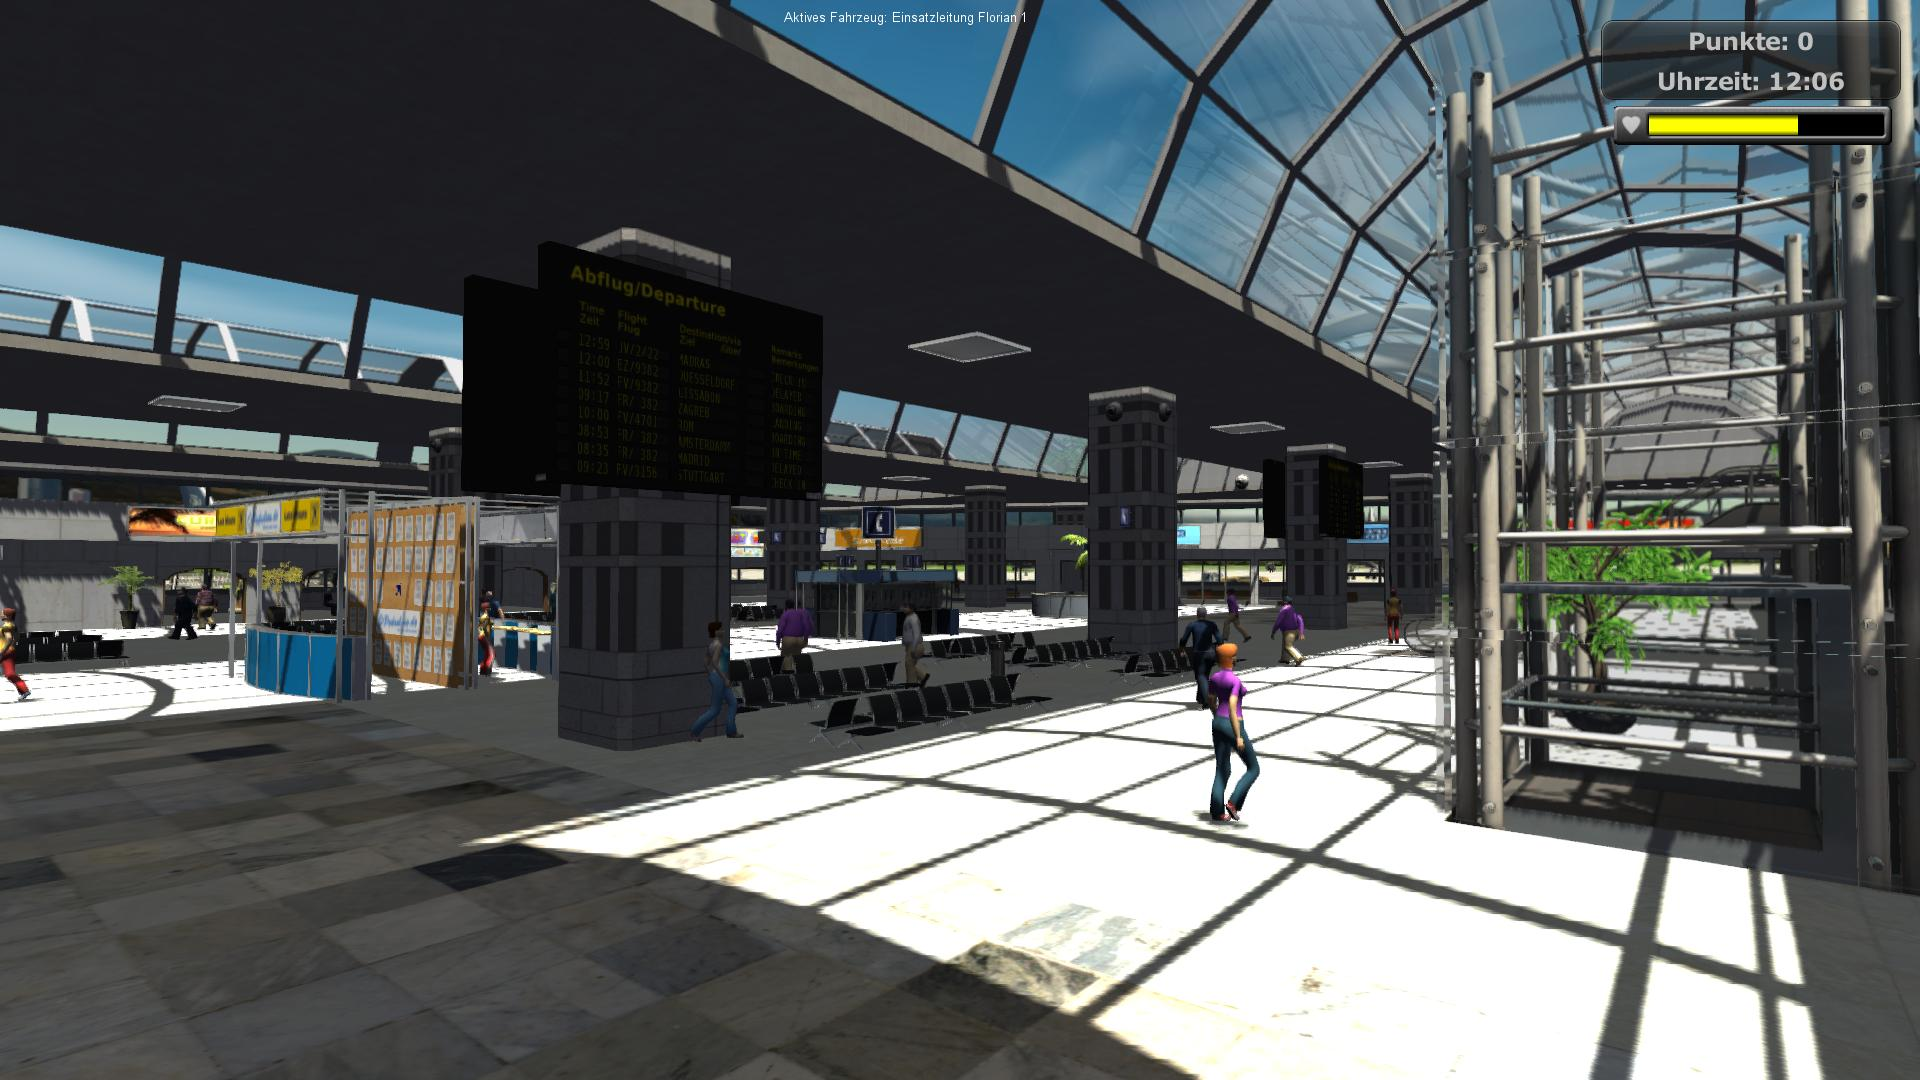 Flughafen Feuerwehr Simulator 2013: PC: Amazon.de: Games